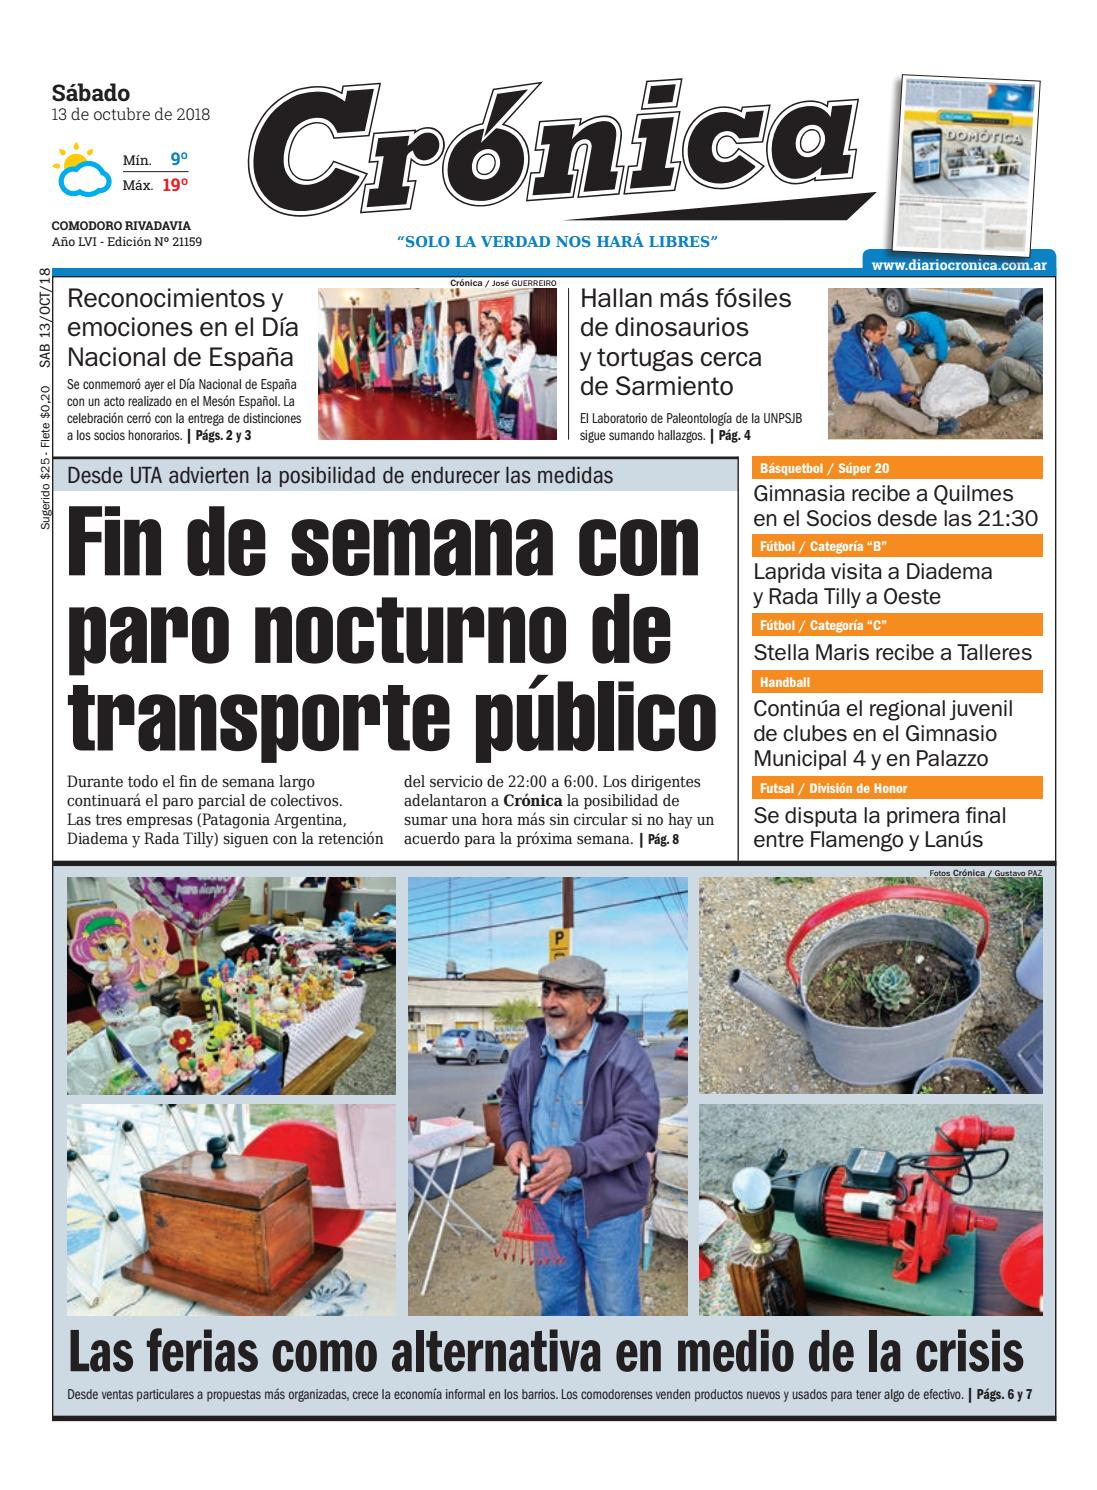 Crónica 10 13 2018 By Cronica Issuu Diario 3jL5RA4